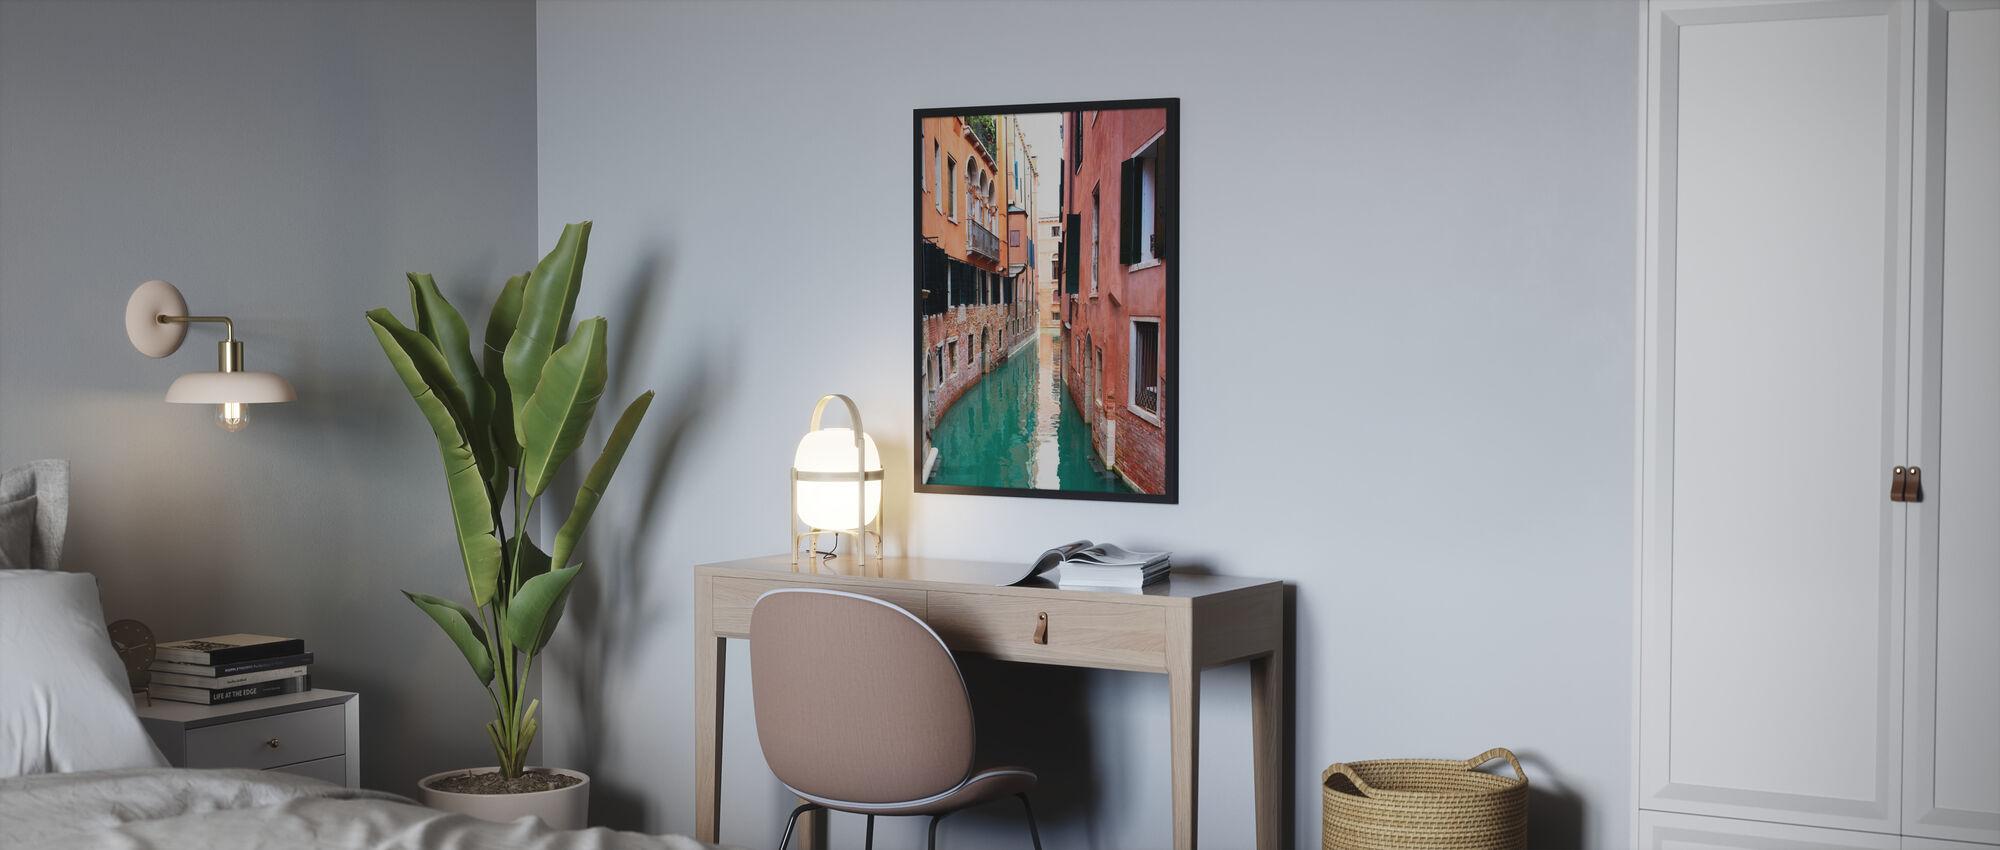 Lugn i Venedig - Inramad tavla - Sovrum